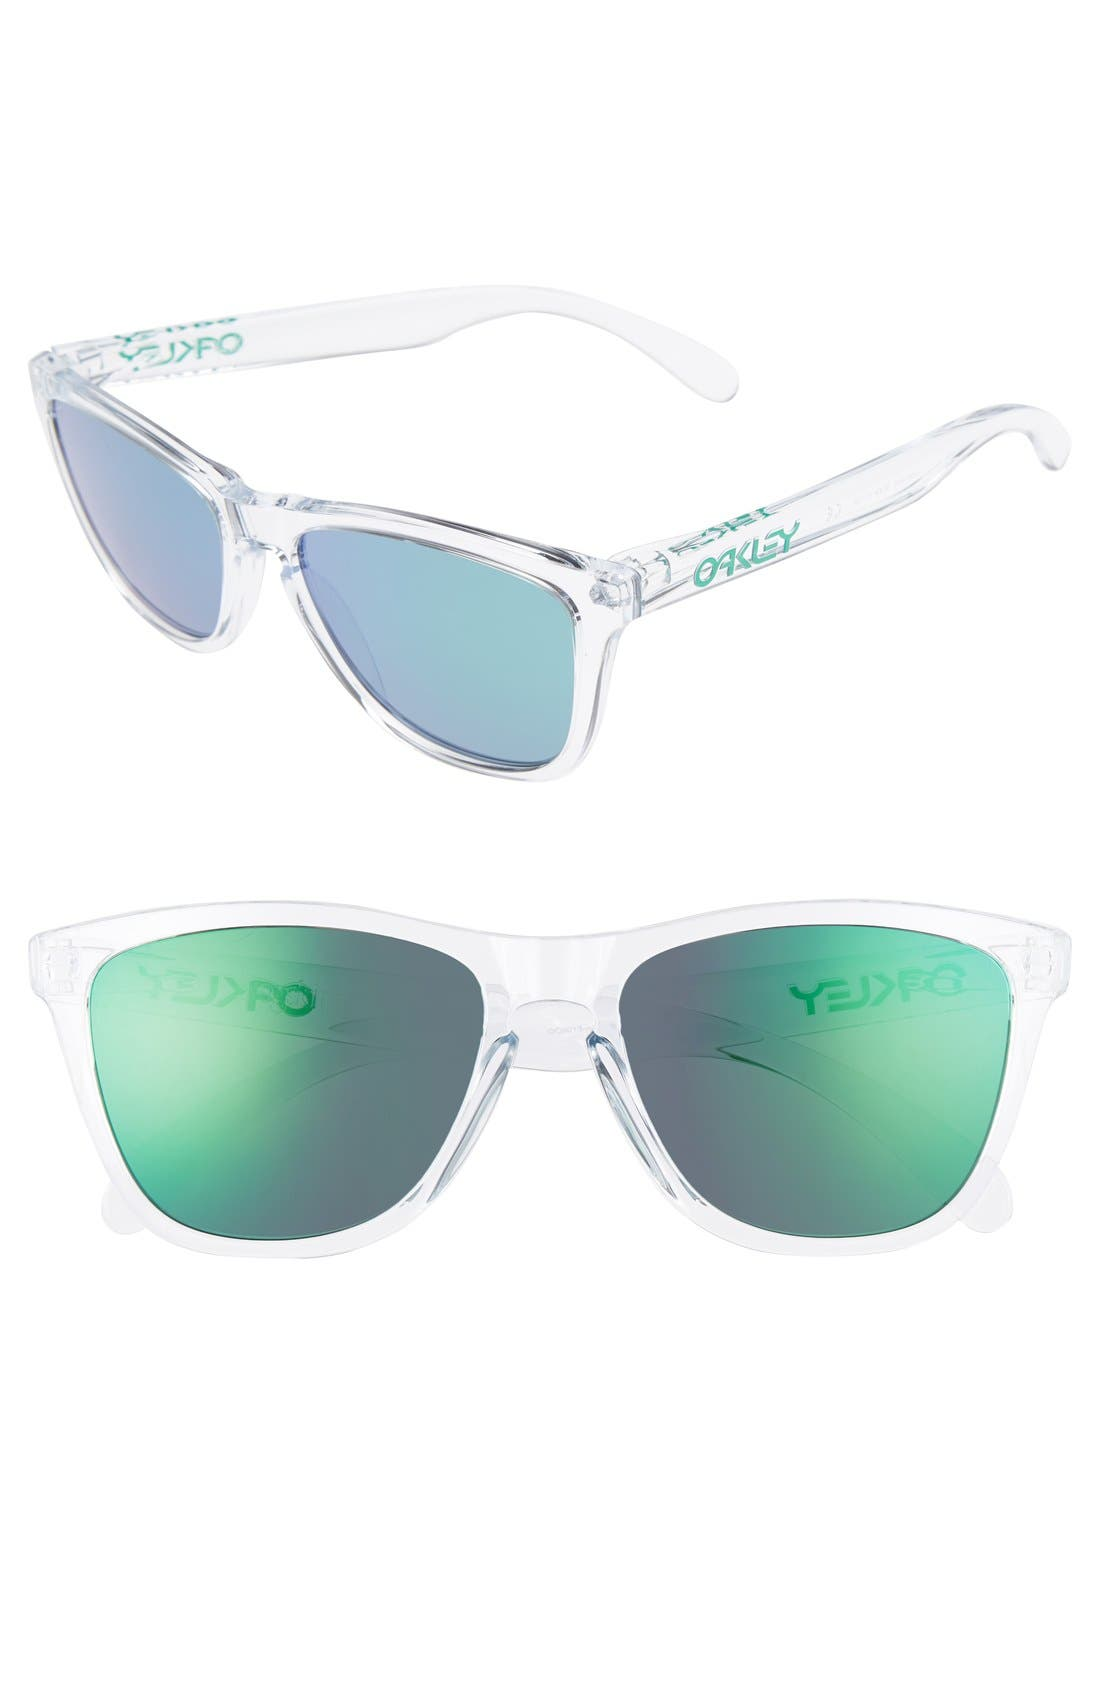 Alternate Image 1 Selected - Oakley Frogskins® 55mm Sunglasses